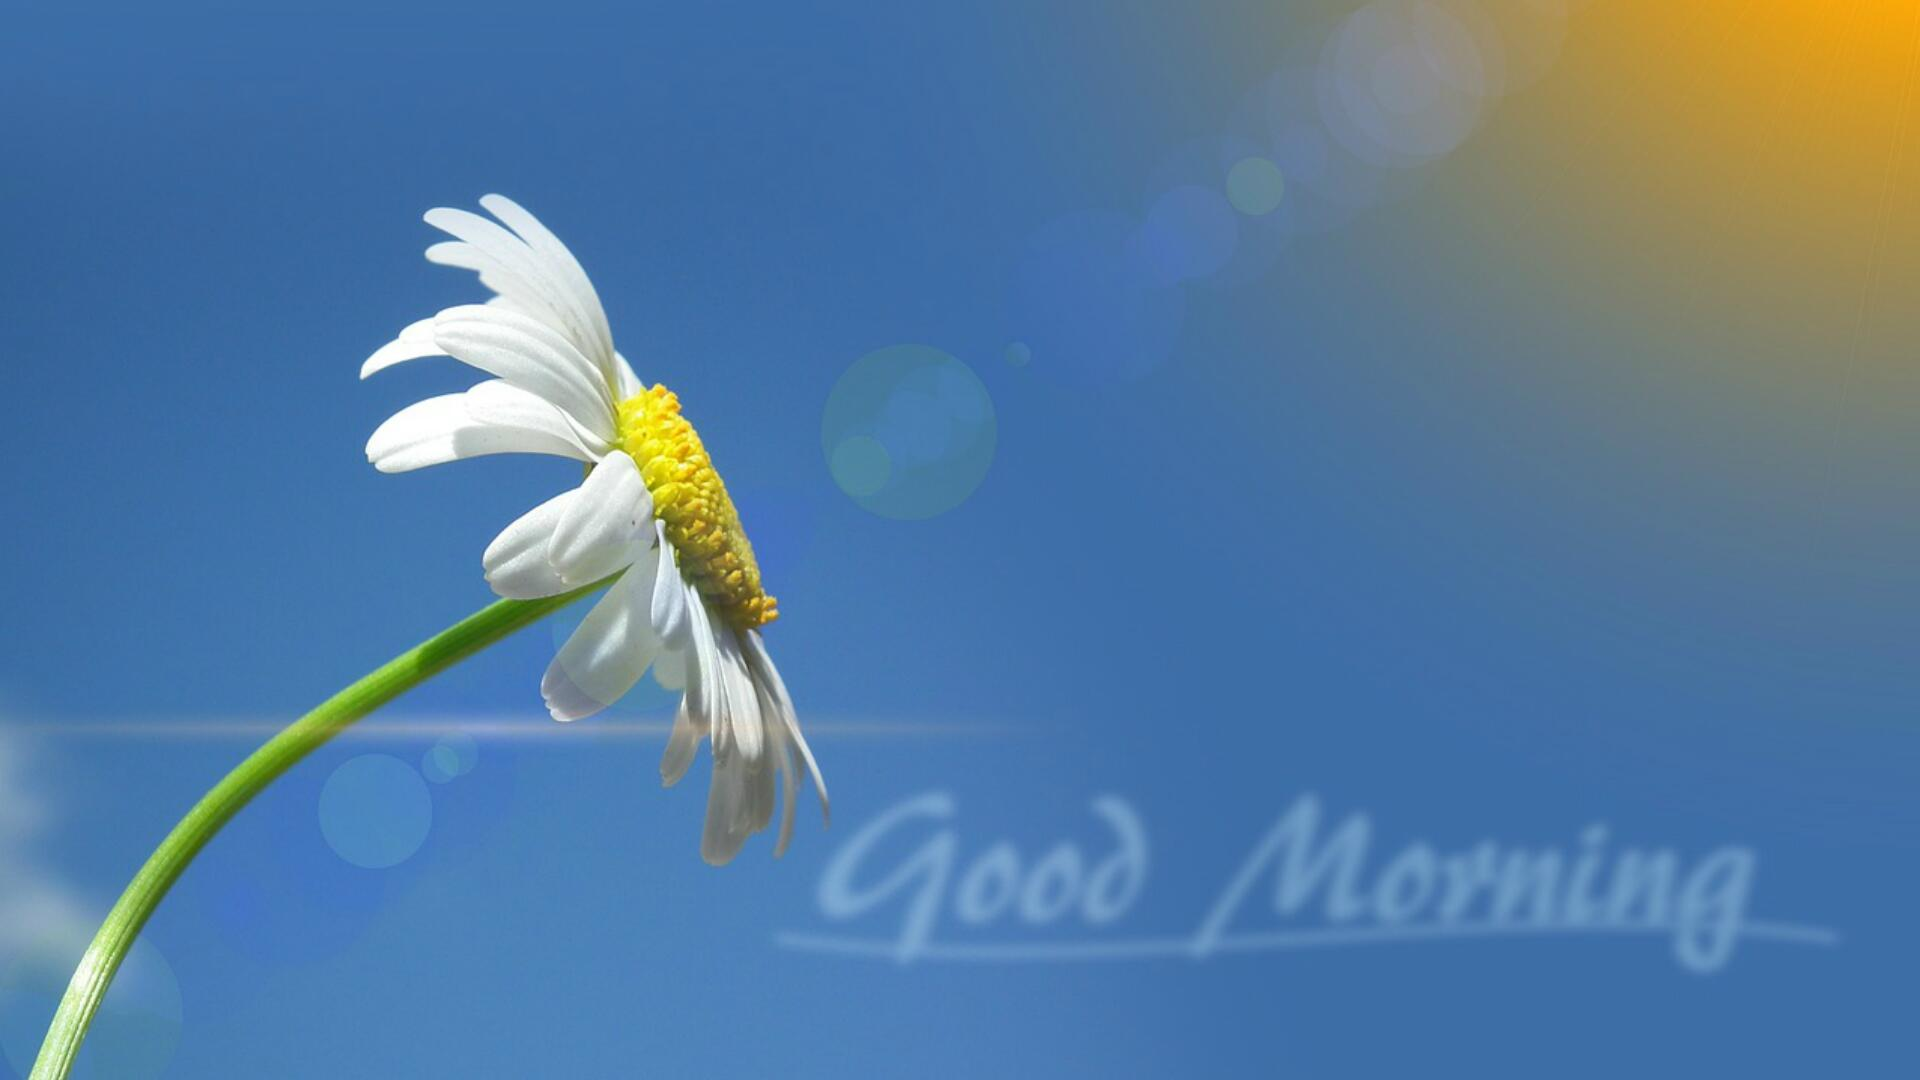 Sadhguru Good Morning Quotes , HD Wallpaper & Backgrounds